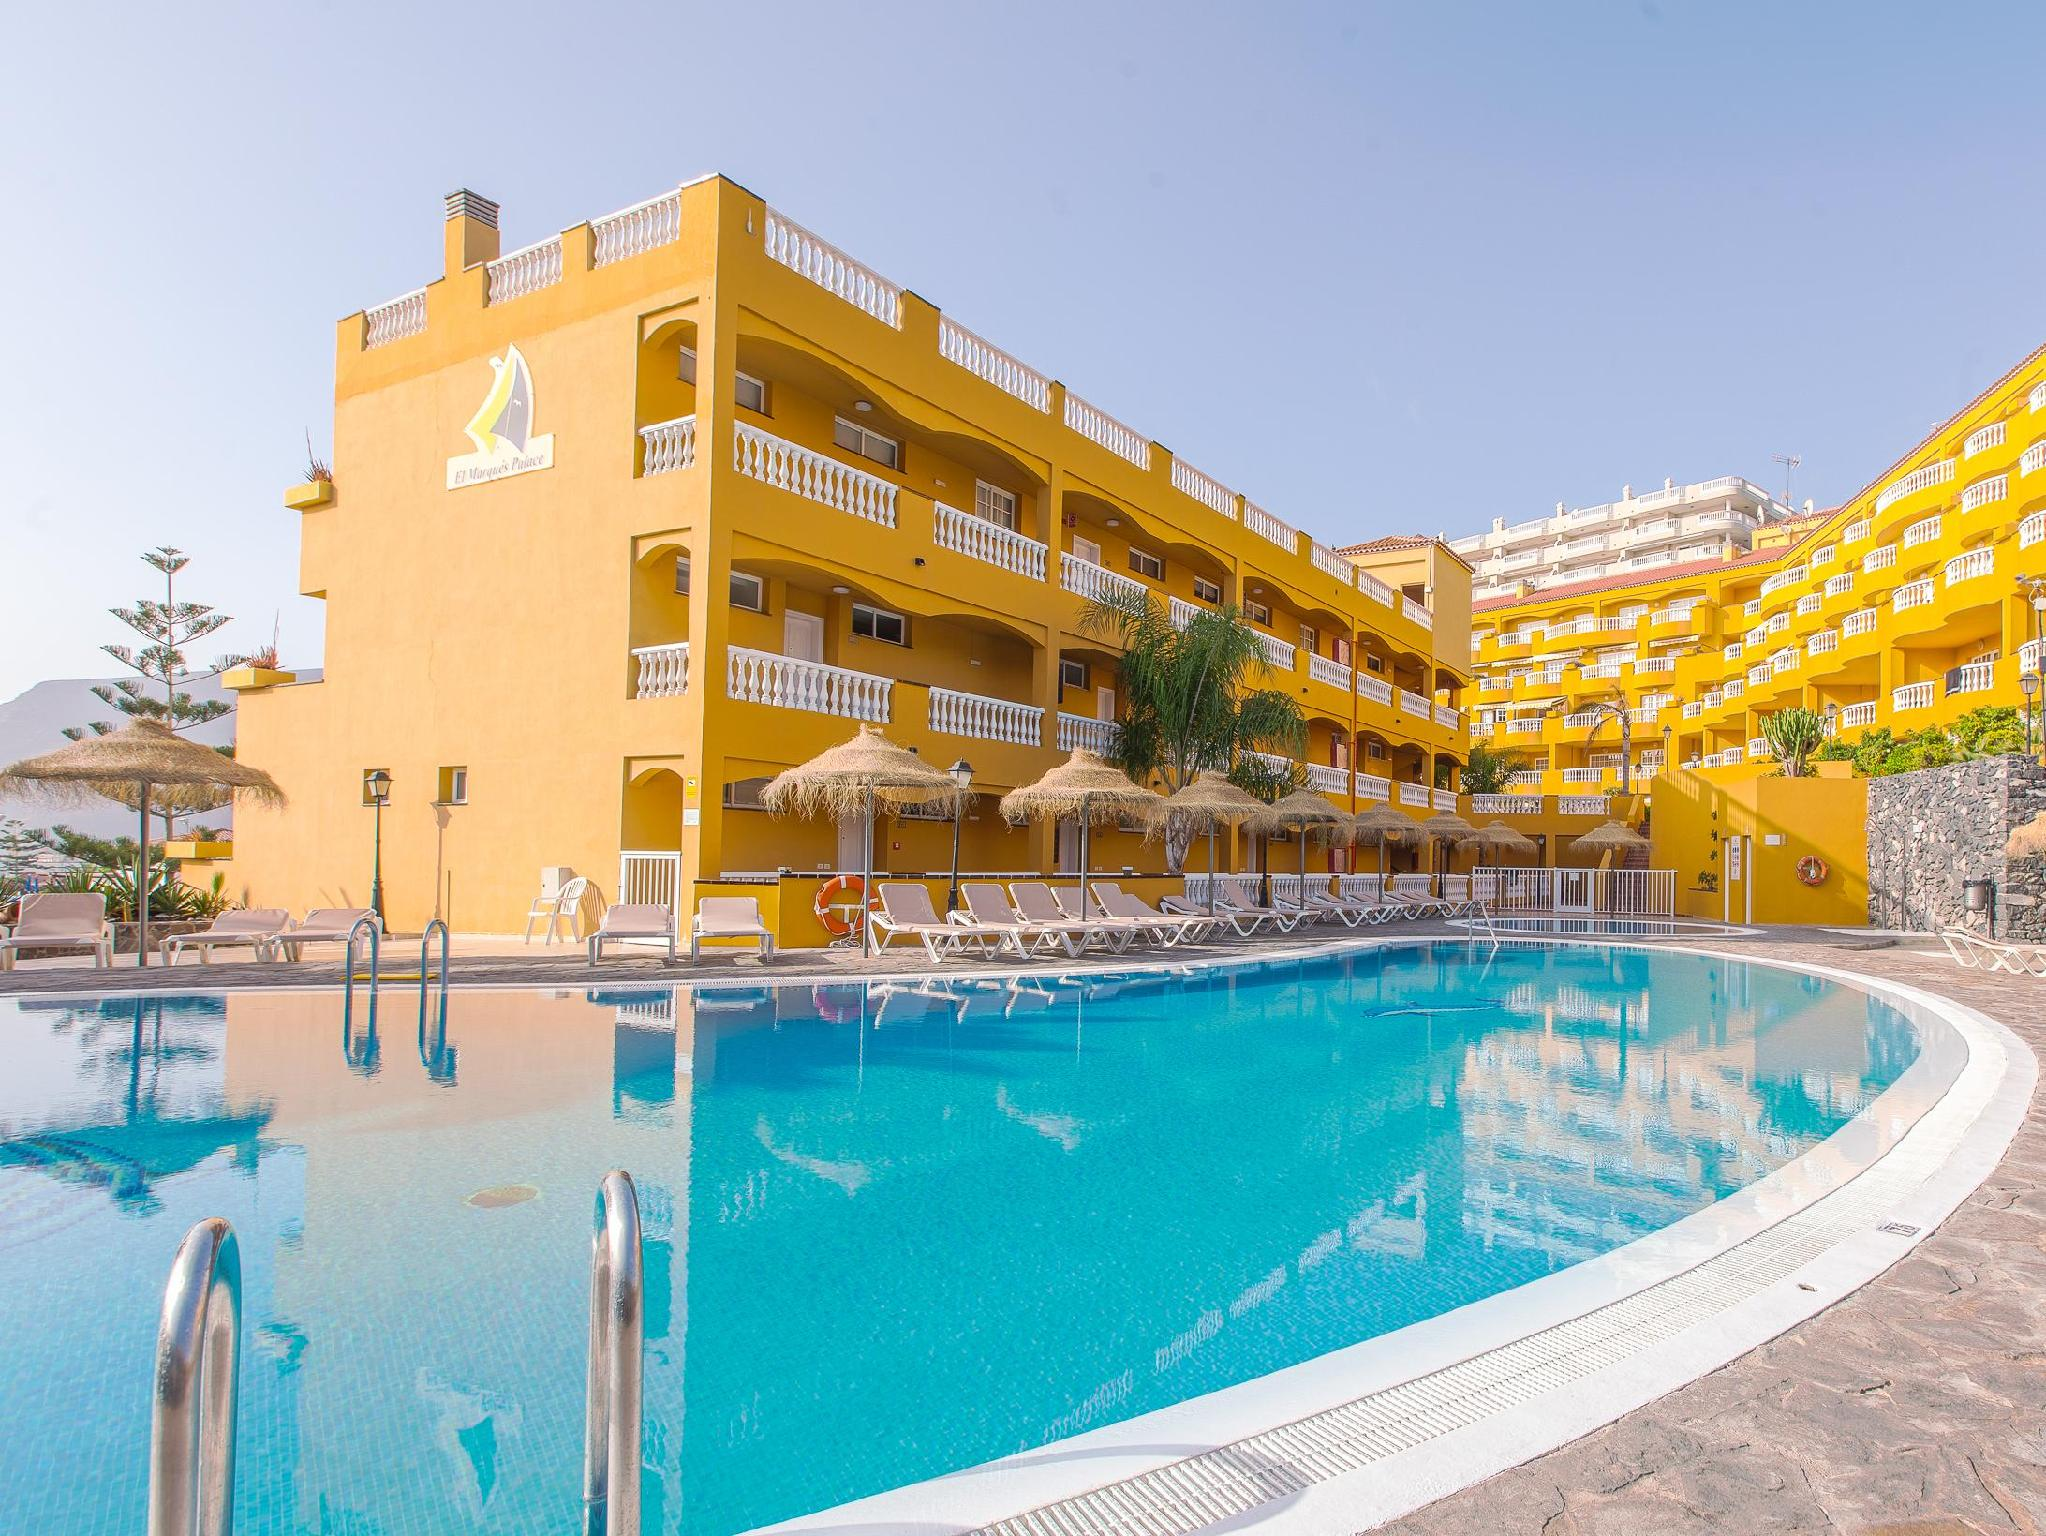 Aparthotel El Marques Palace